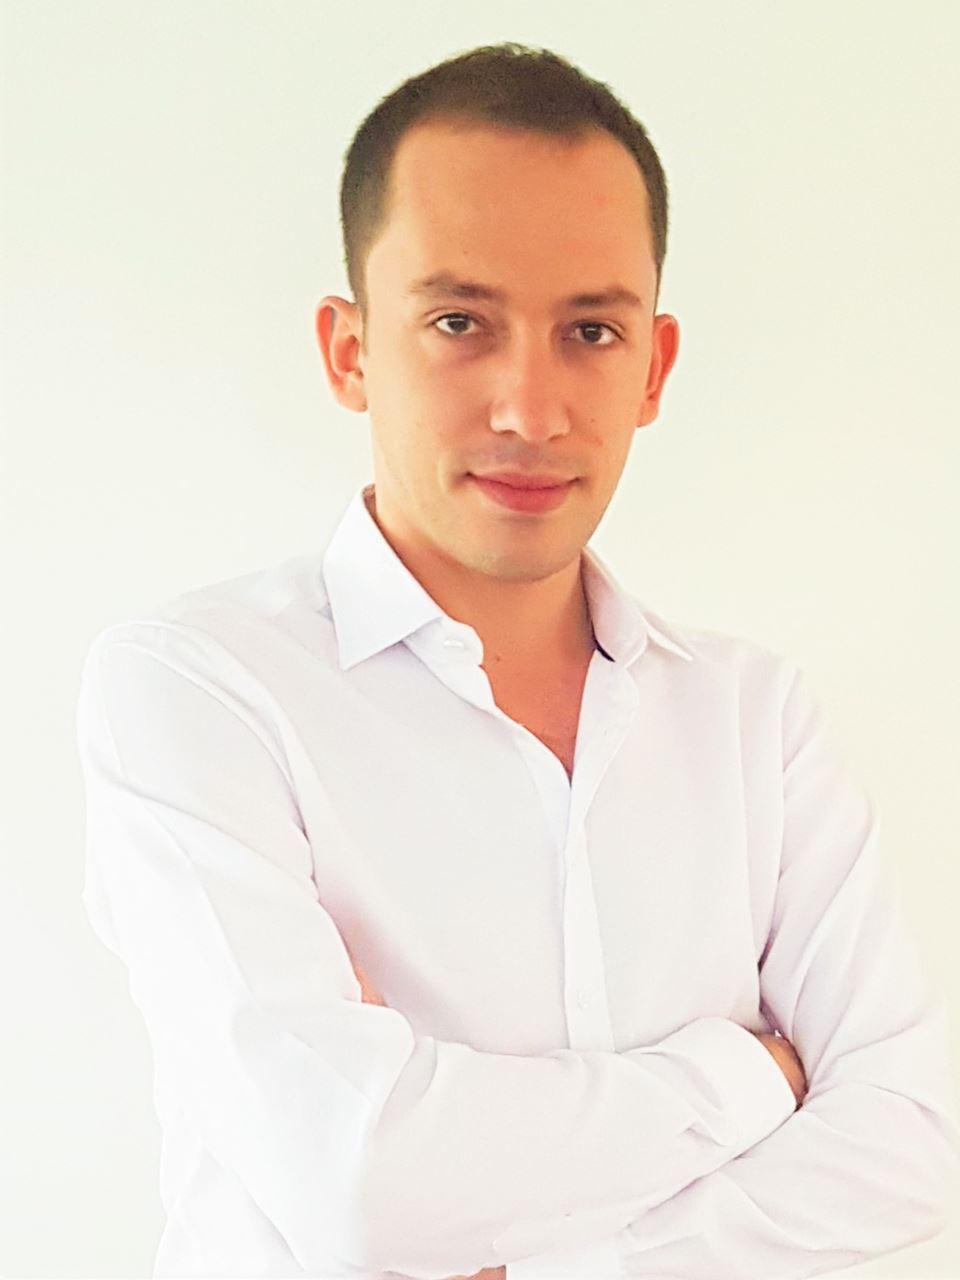 Mustafa Kökmen